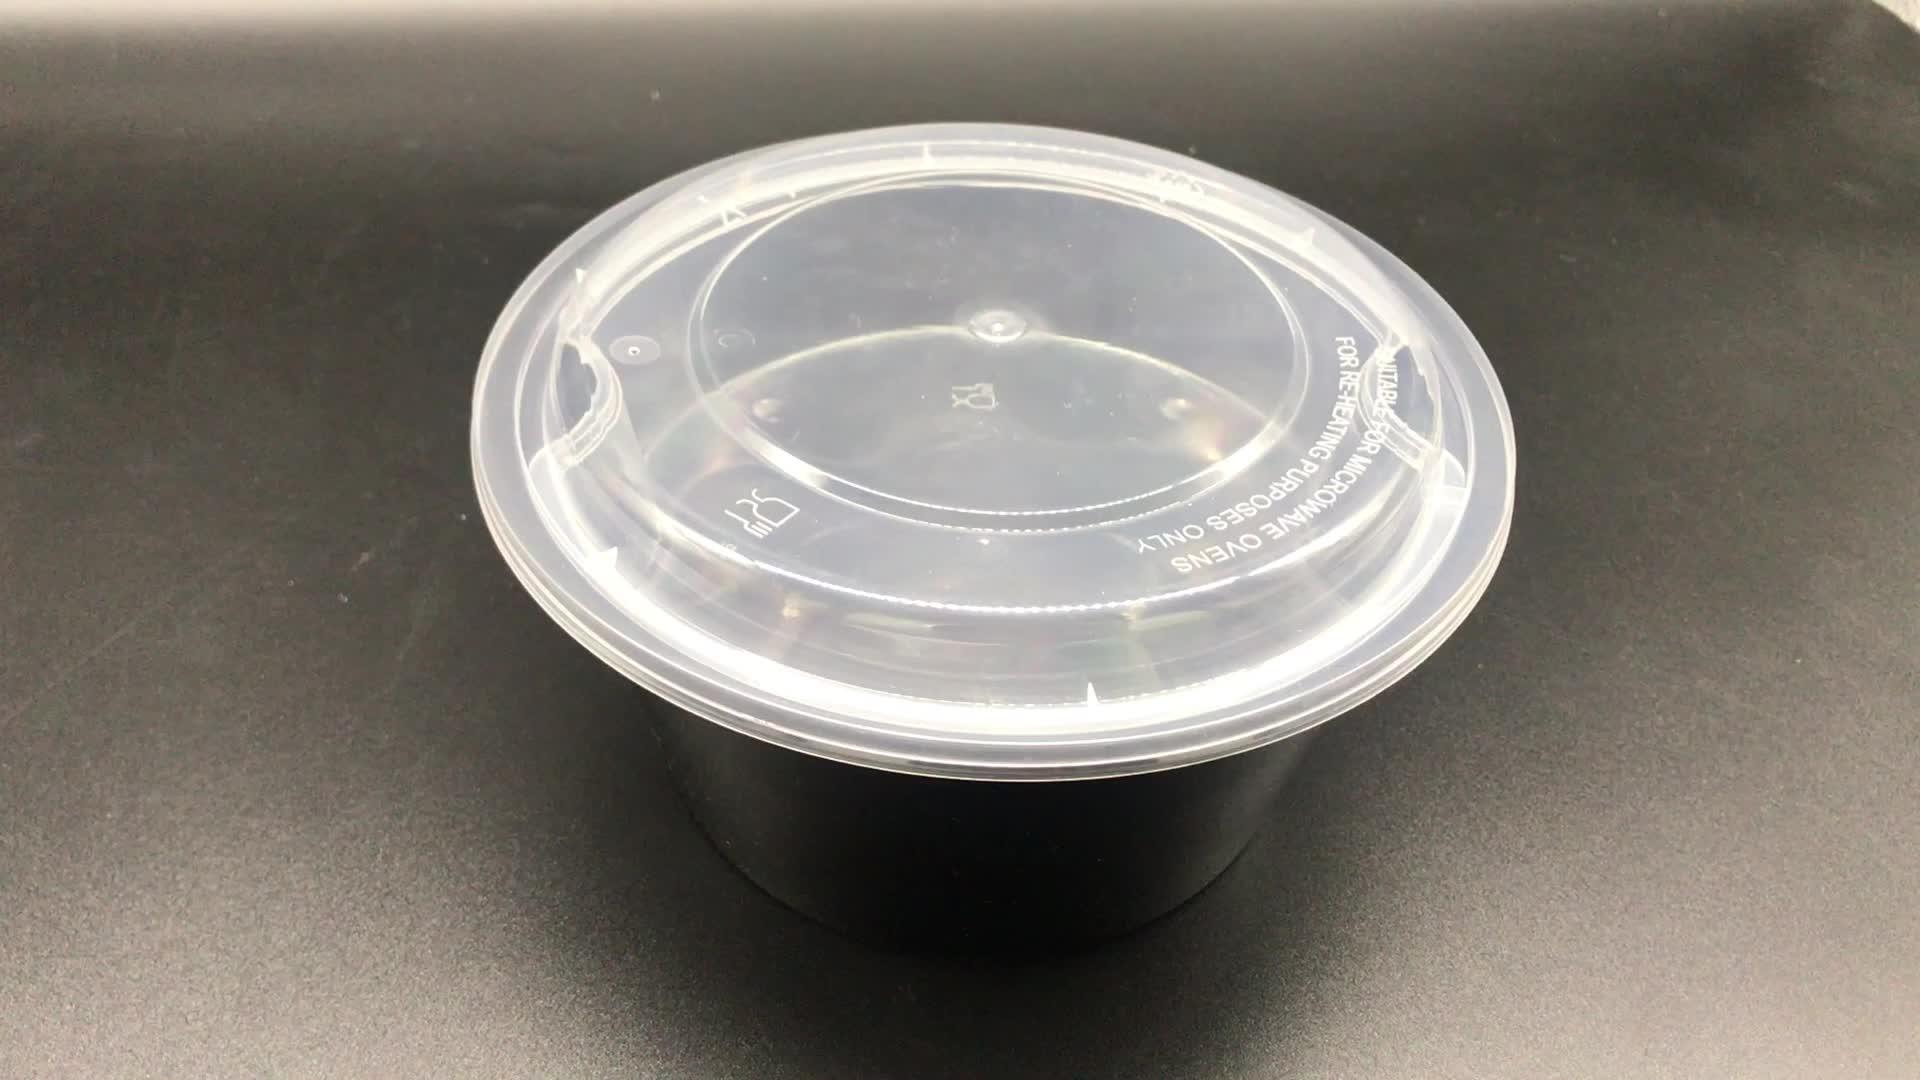 Compartimento venta premium reutilizable de plástico caja de almuerzo con tapa